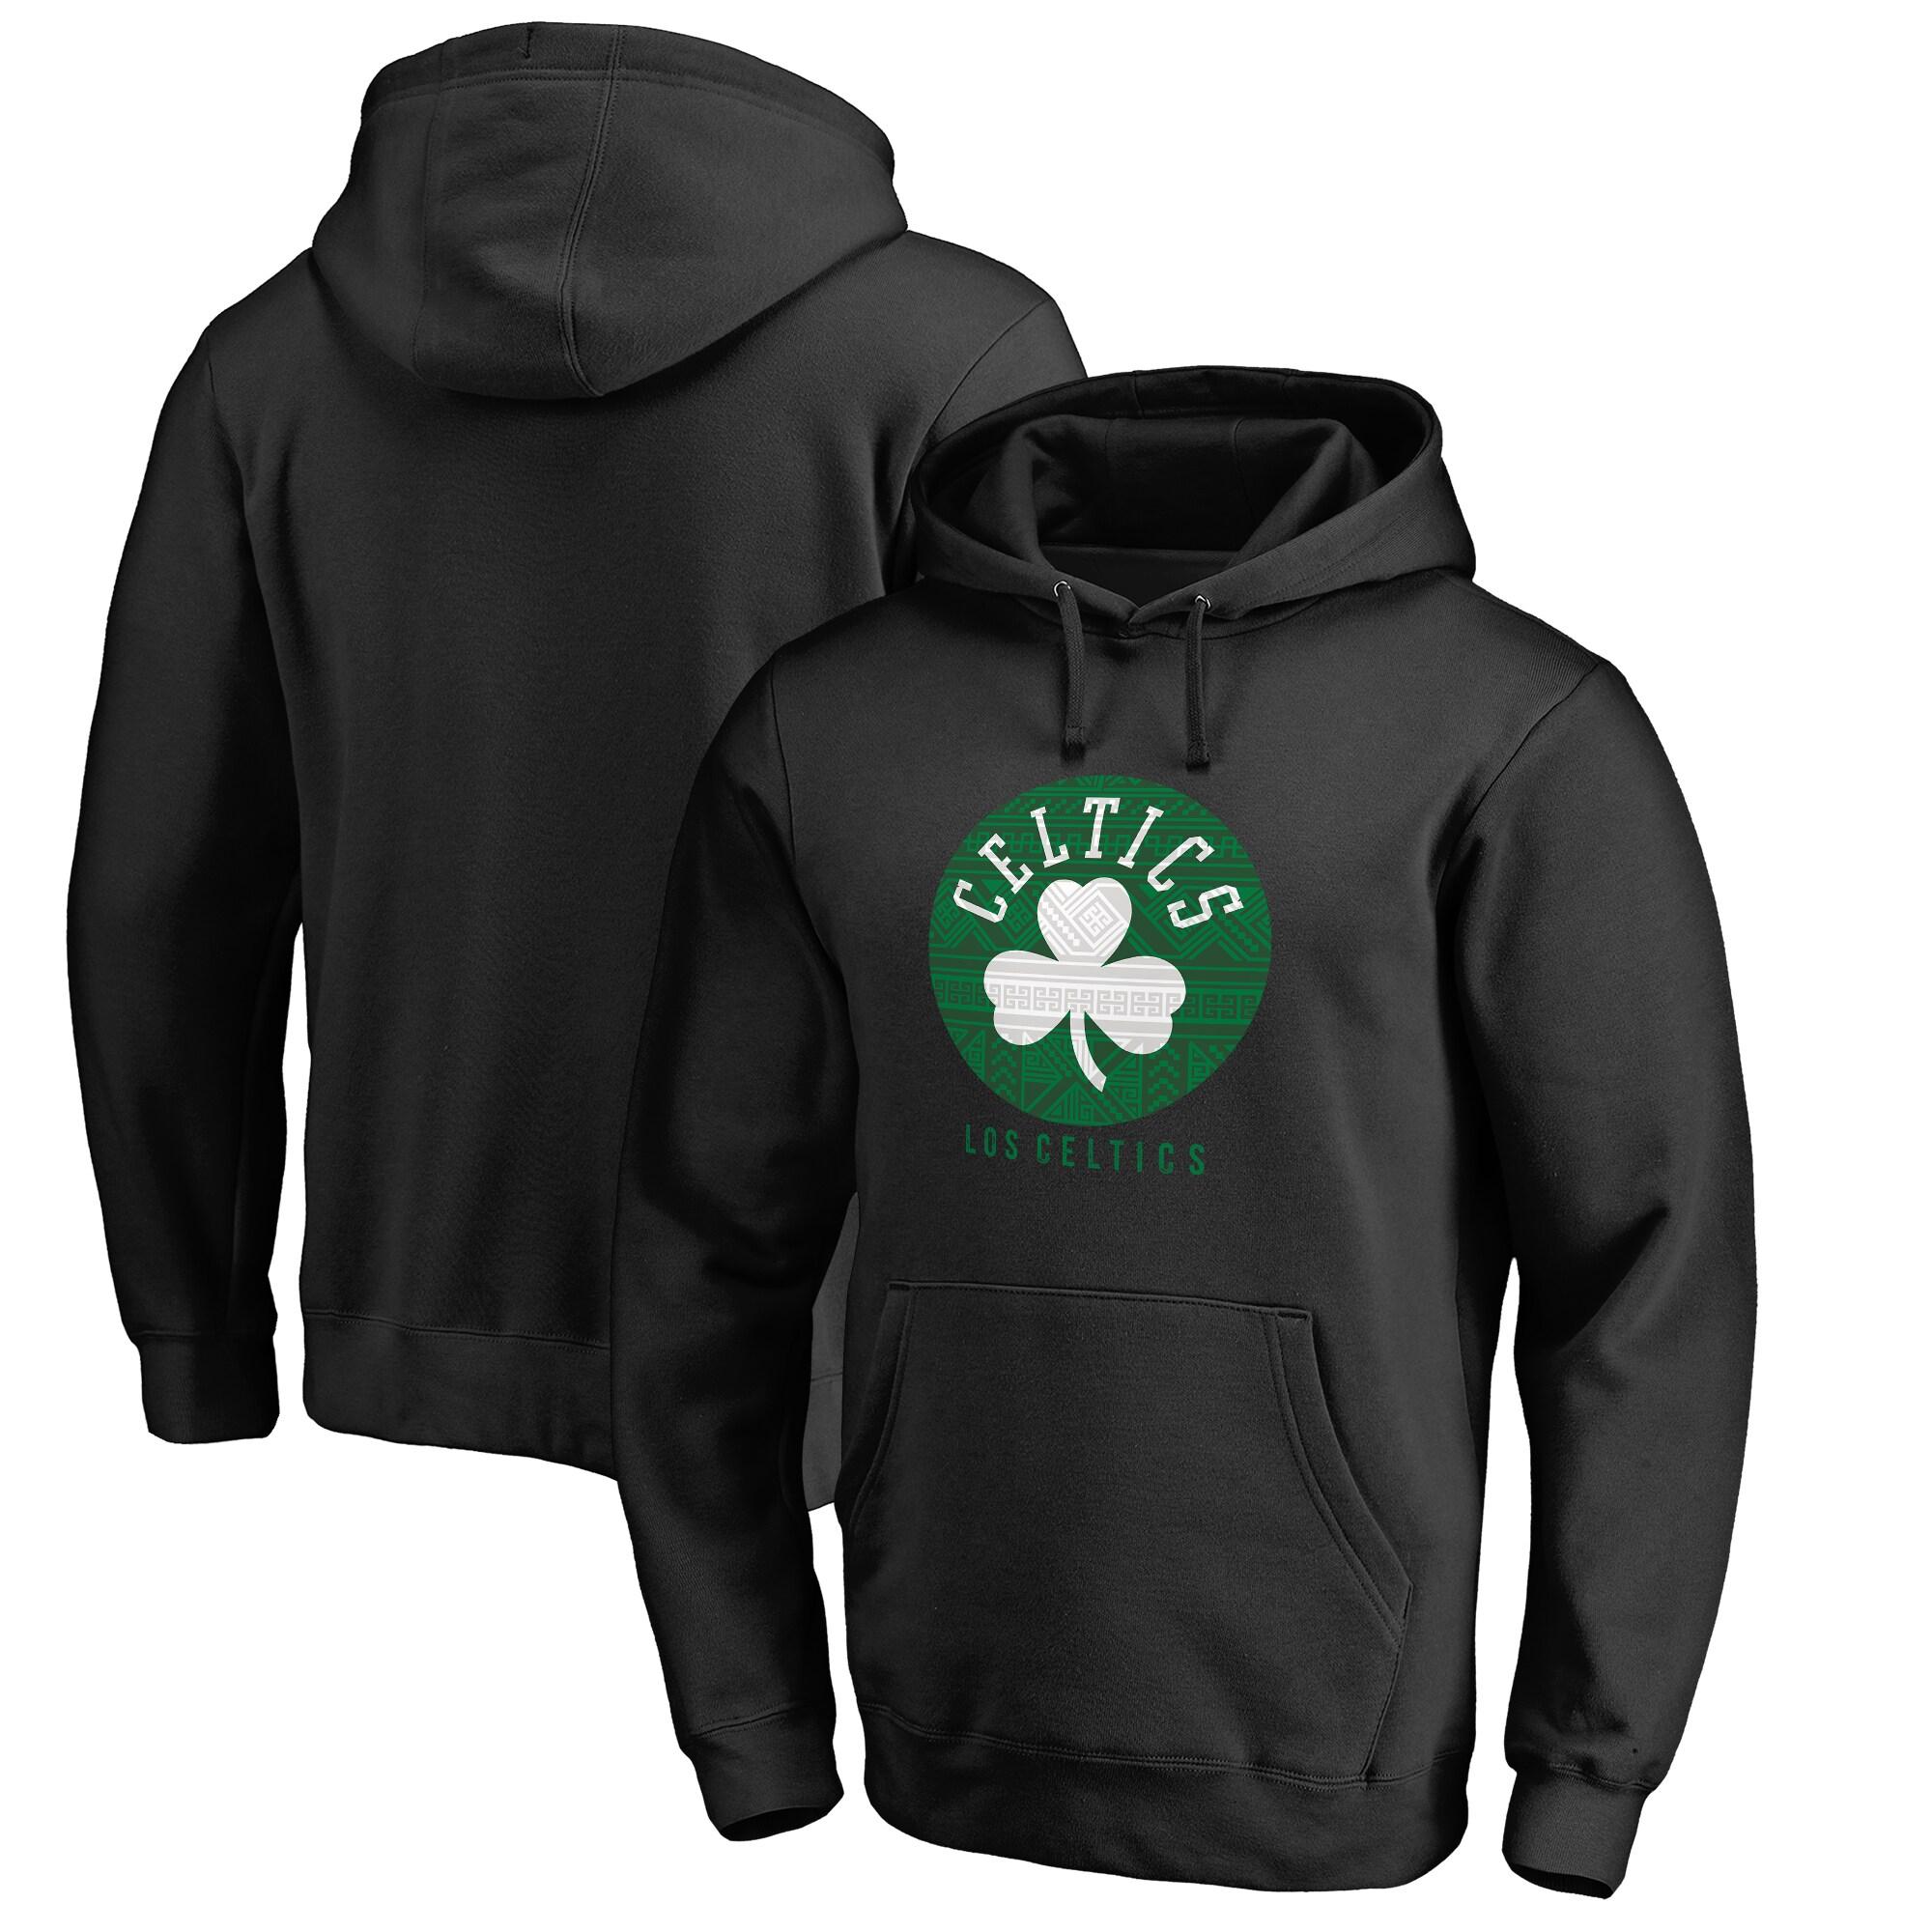 Boston Celtics Fanatics Branded 2017 Noches Éne-Bé-A Pullover Hoodie - Black